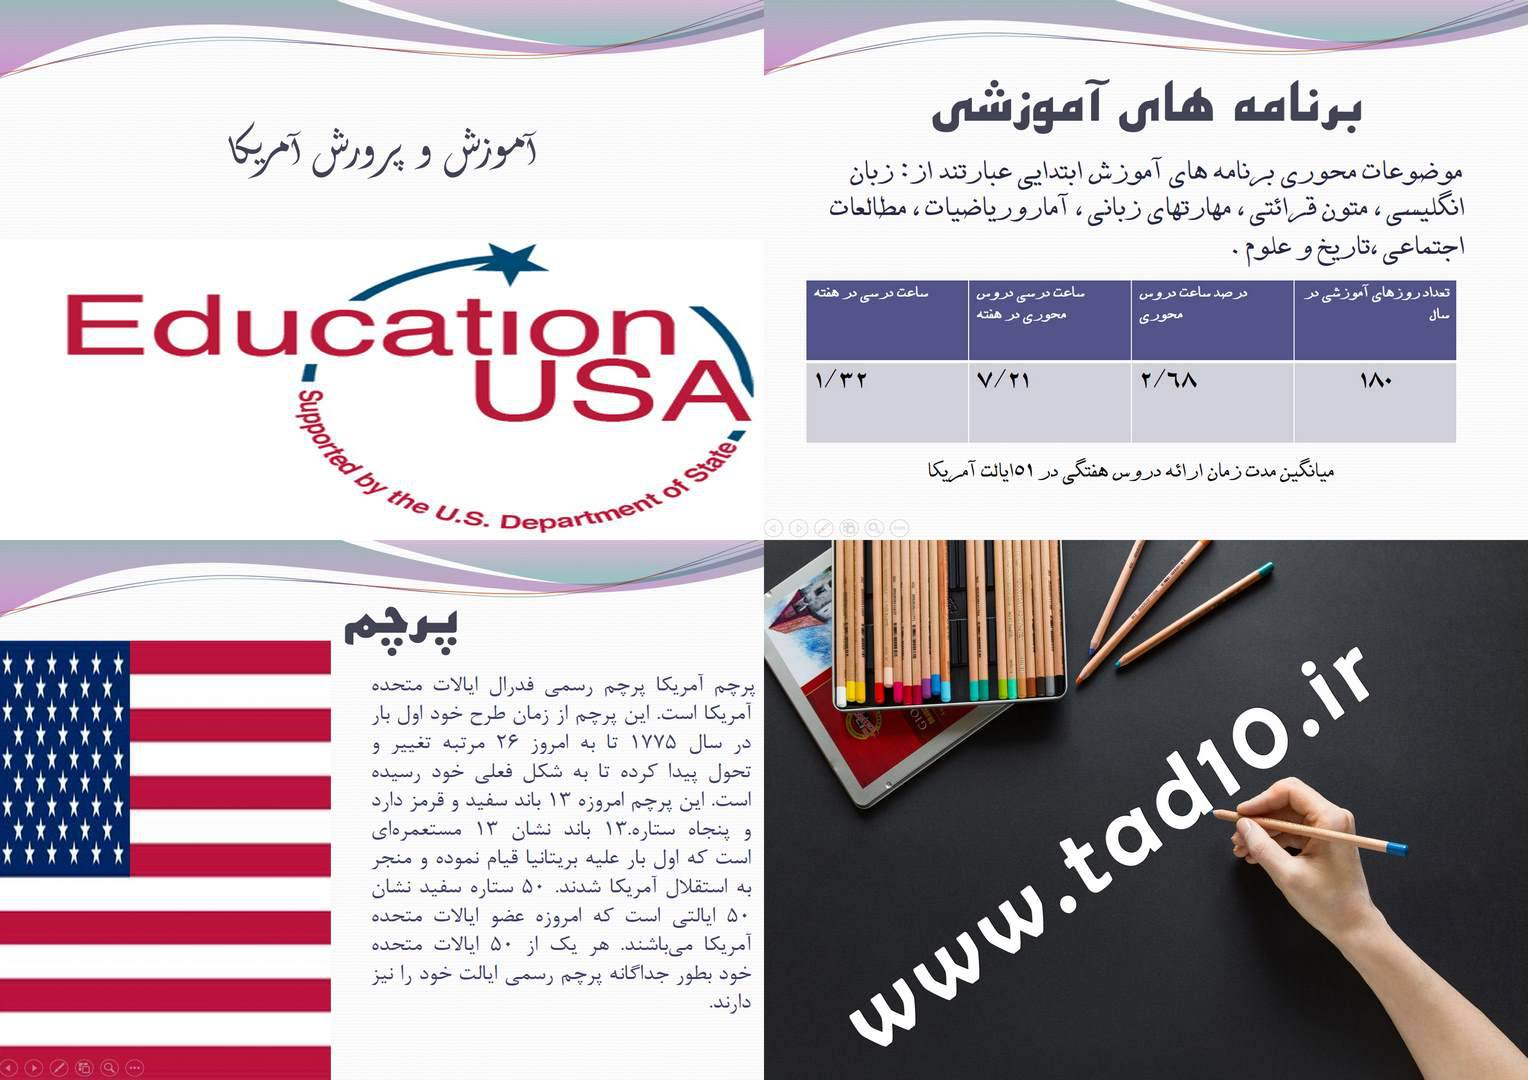 پاورپوینت آموزش و پرورش آمریکا